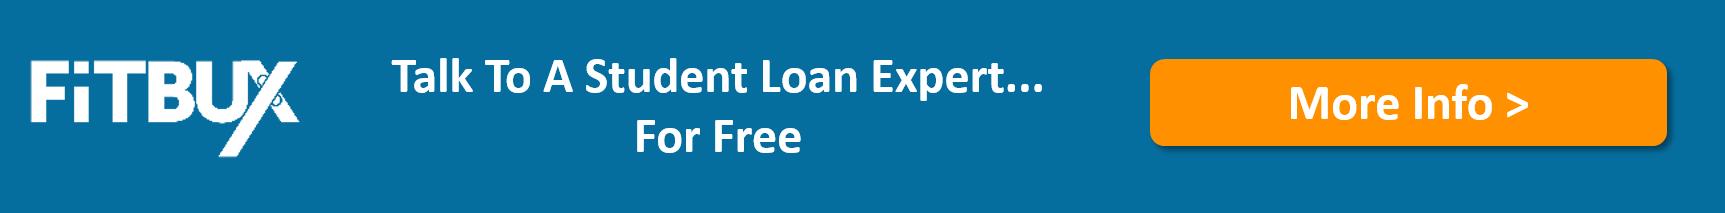 Expert Student Loan Planner